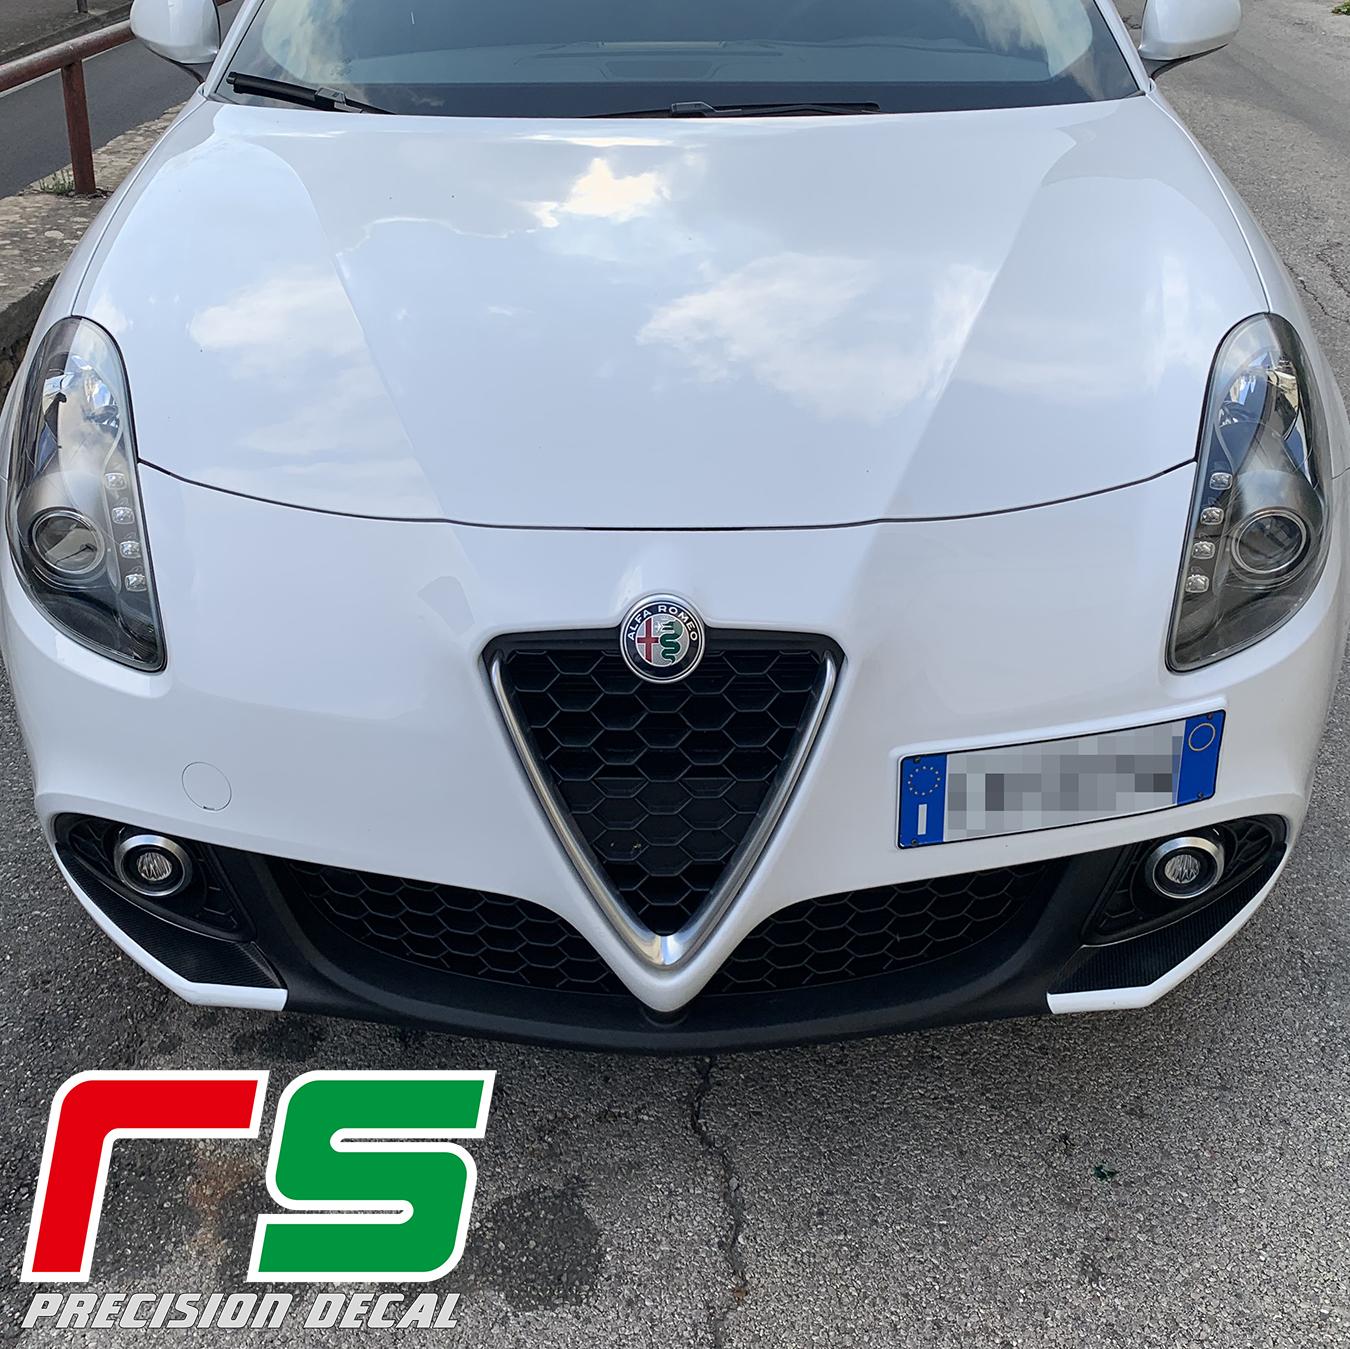 Alfa Romeo Giulietta Decal paraurti inserti baffi carbonlook sticker tuning